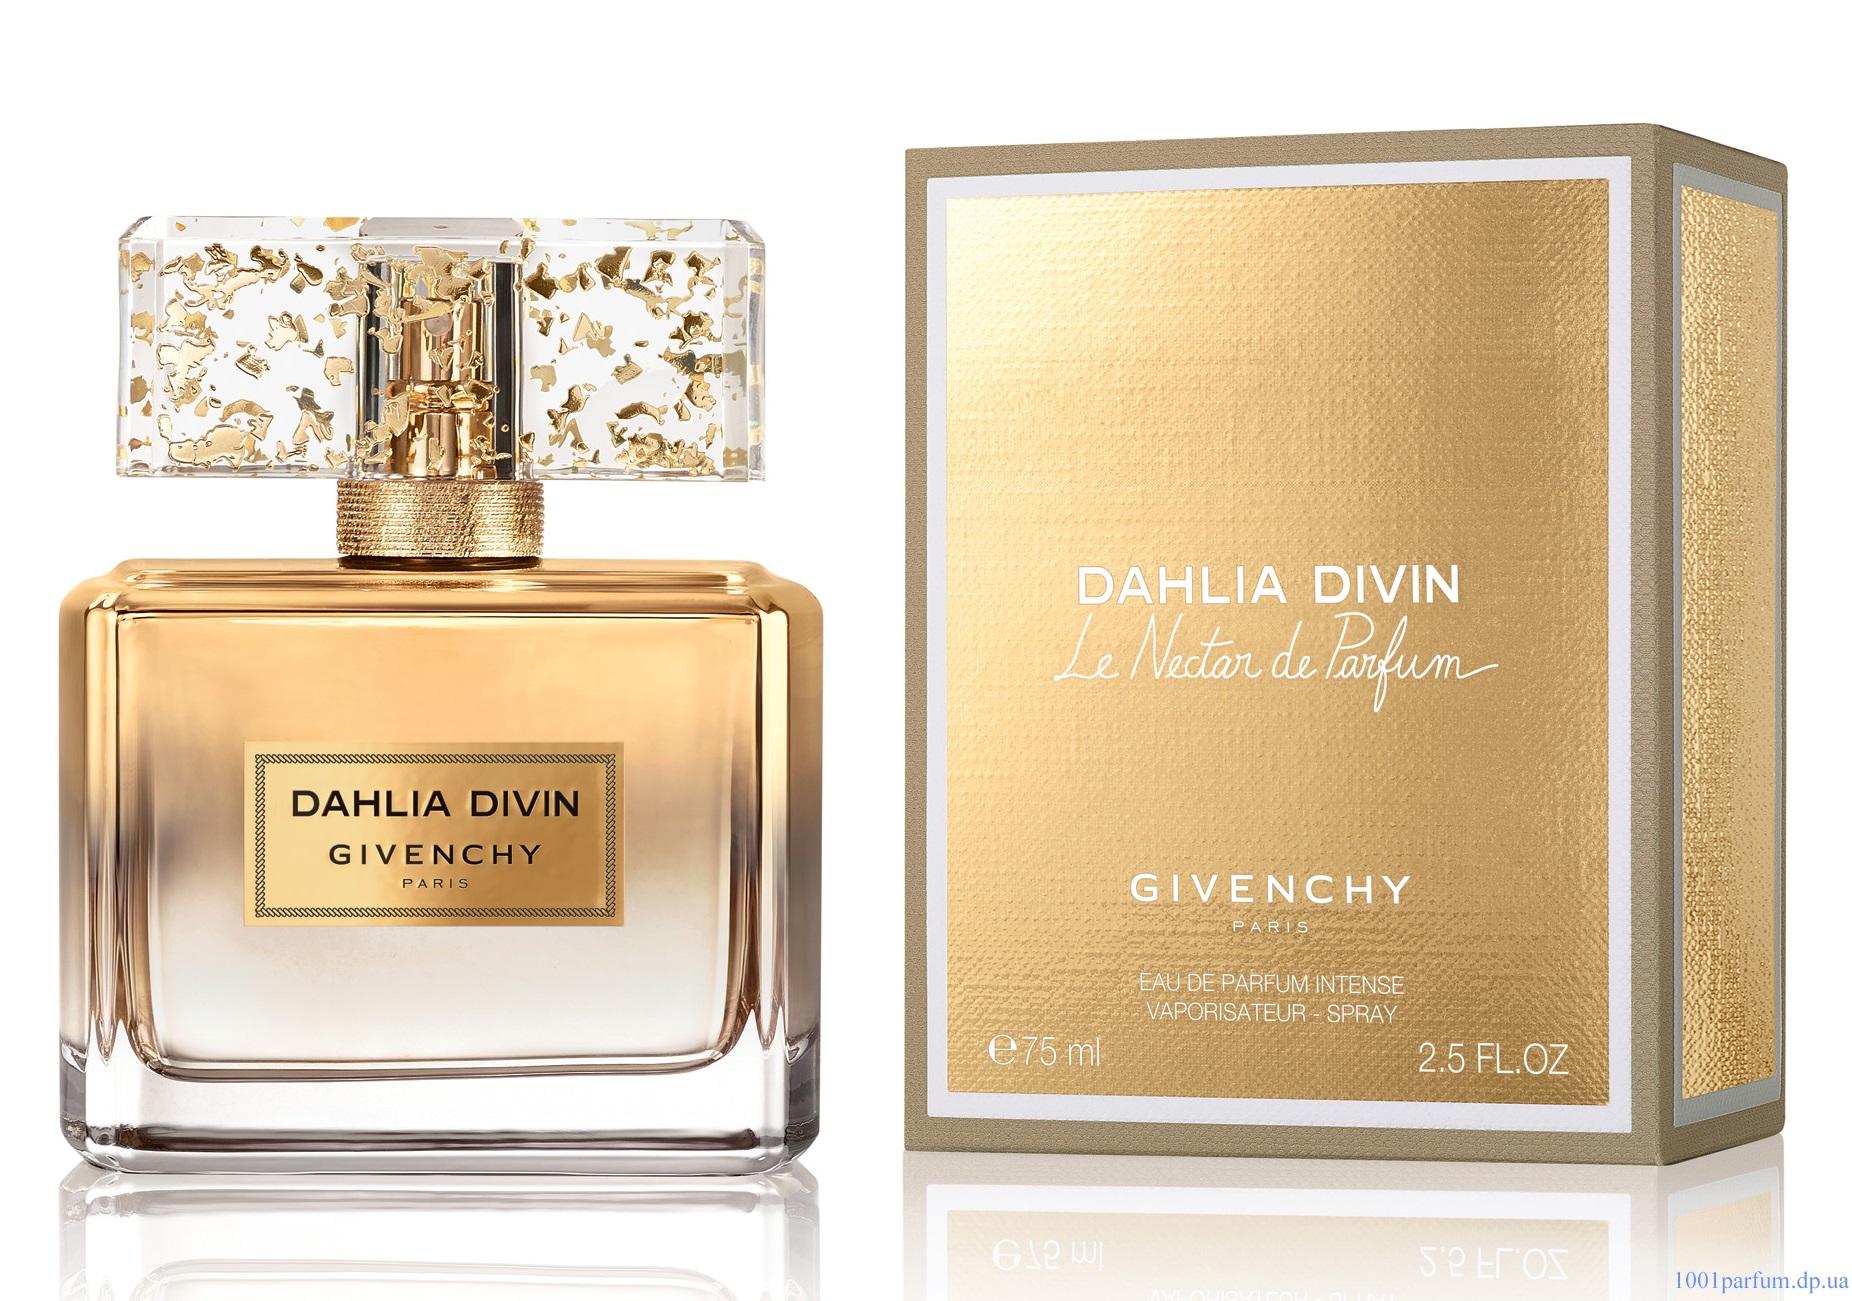 Salon De Jardin Java Inspirant Dahlia Divin Le Nectar De Parfum Givenchy Of 28 Best Of Salon De Jardin Java